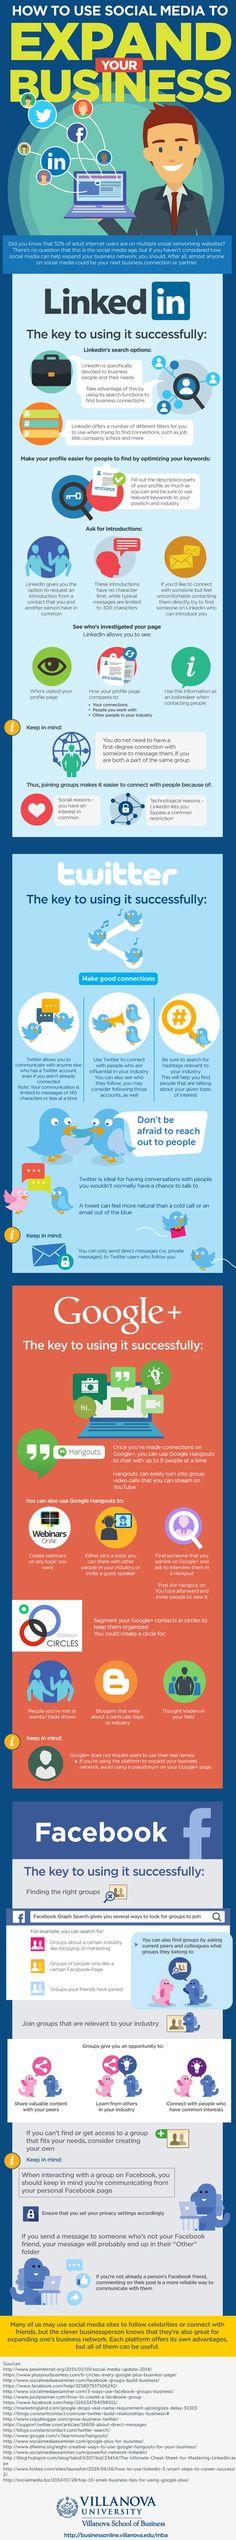 Social Media Mapping Infographic http://socialmediarevolver.com/startup-success-with-social-media-mapping/